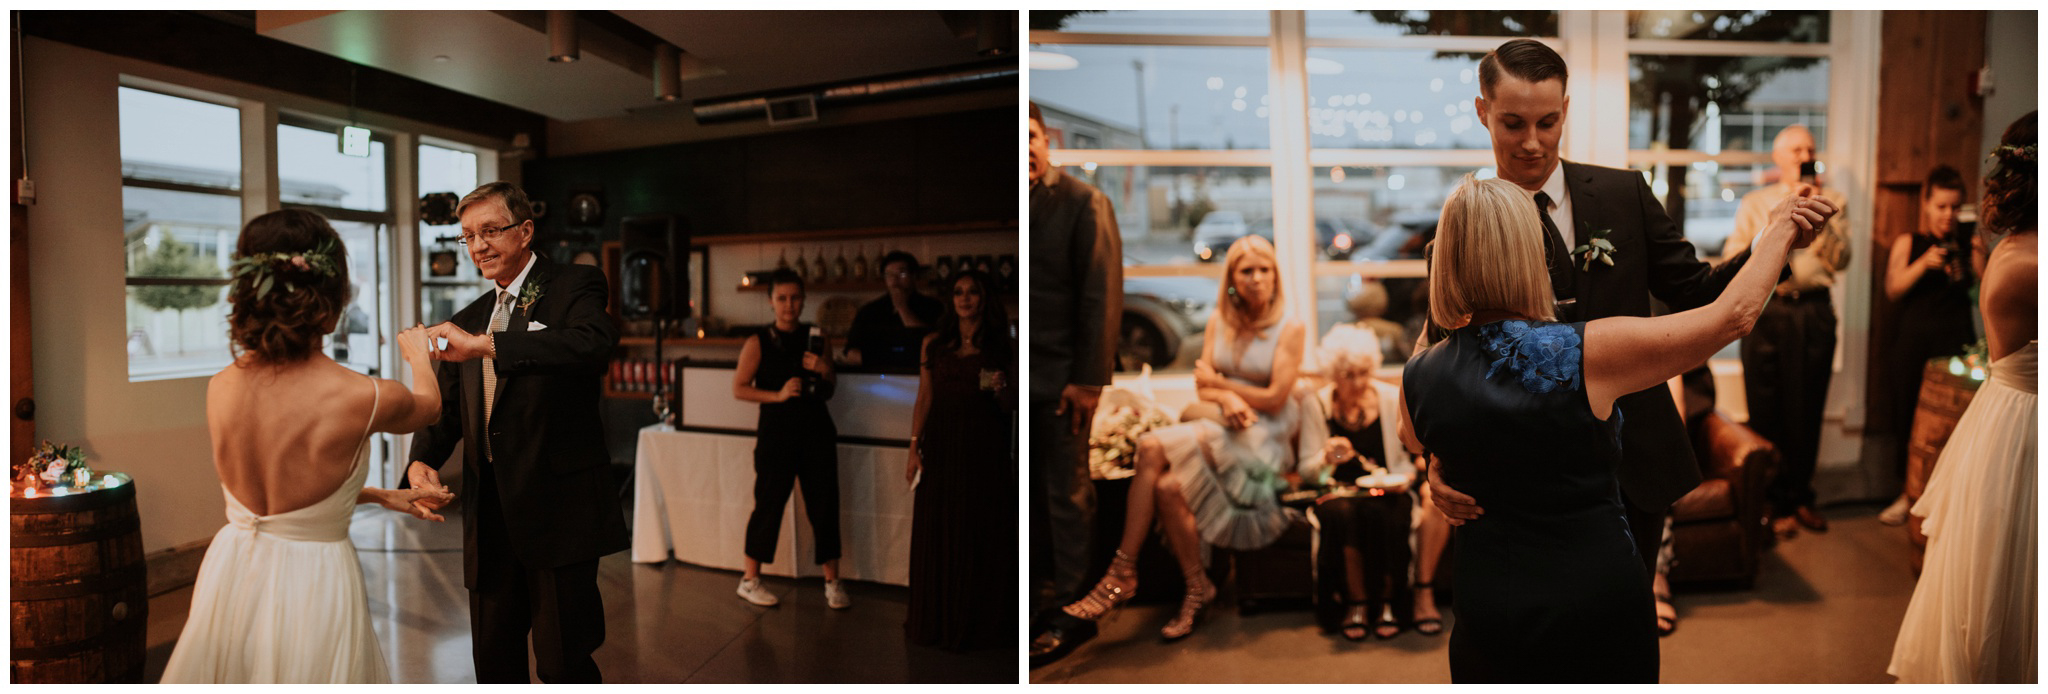 alyssa-keiran-westland-distillery-urban-seattle-wedding-photographer-caitlyn-nikula-151.jpg